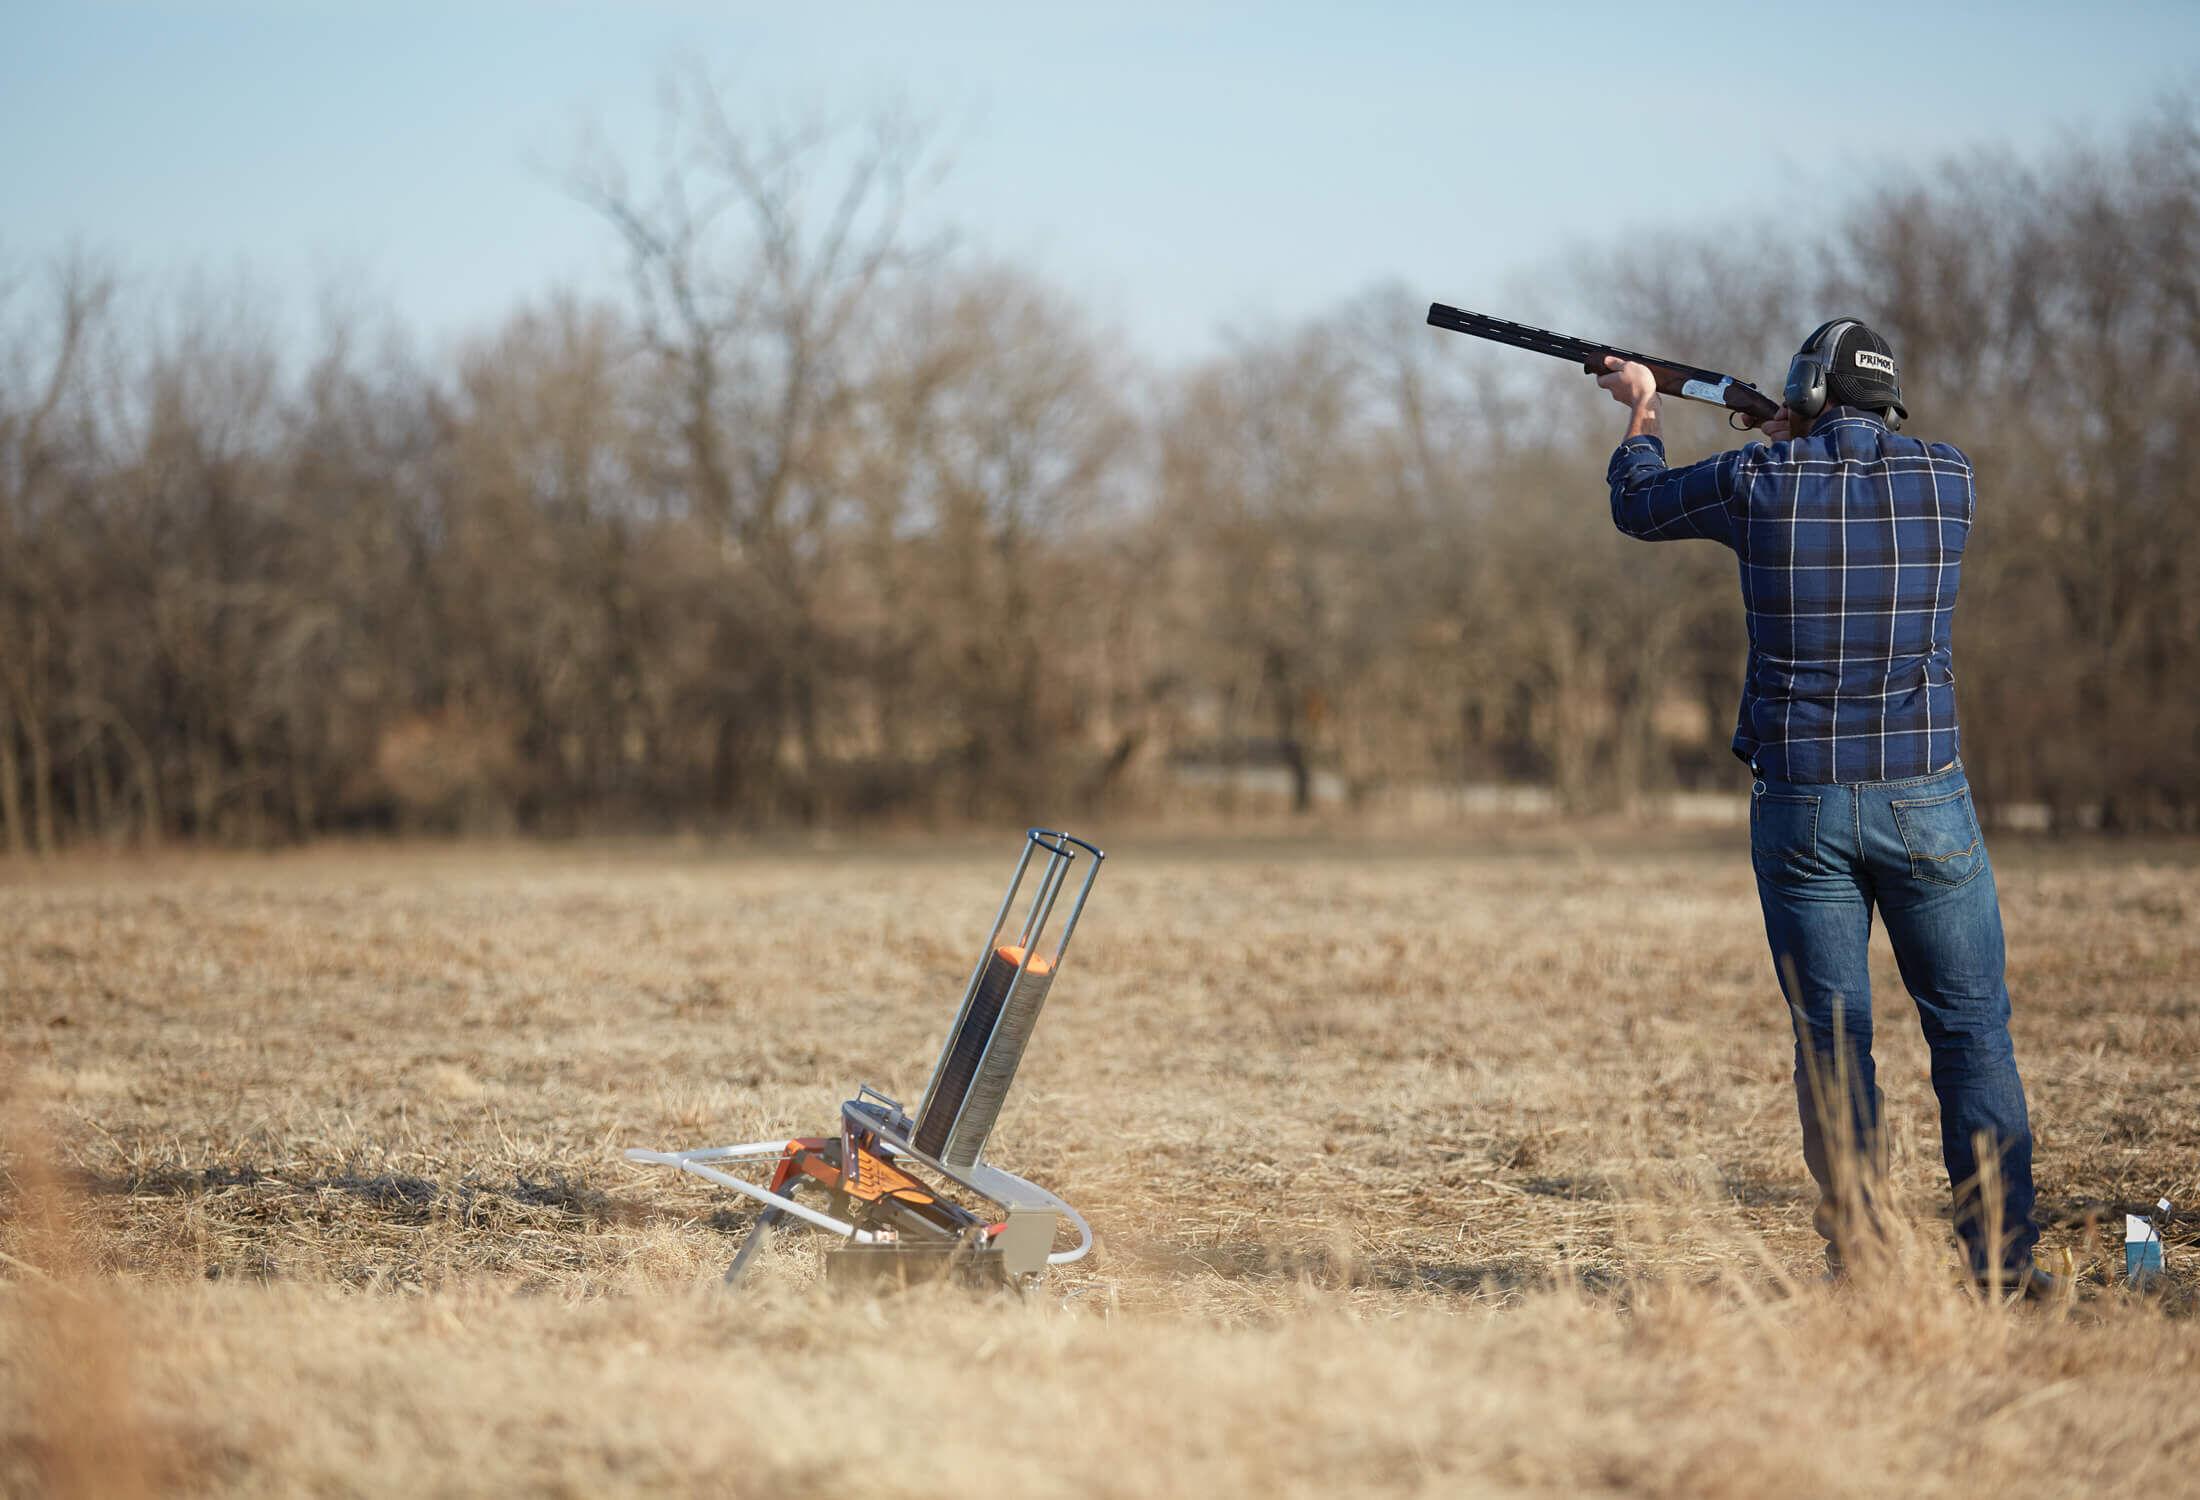 Man shooting Champion targets